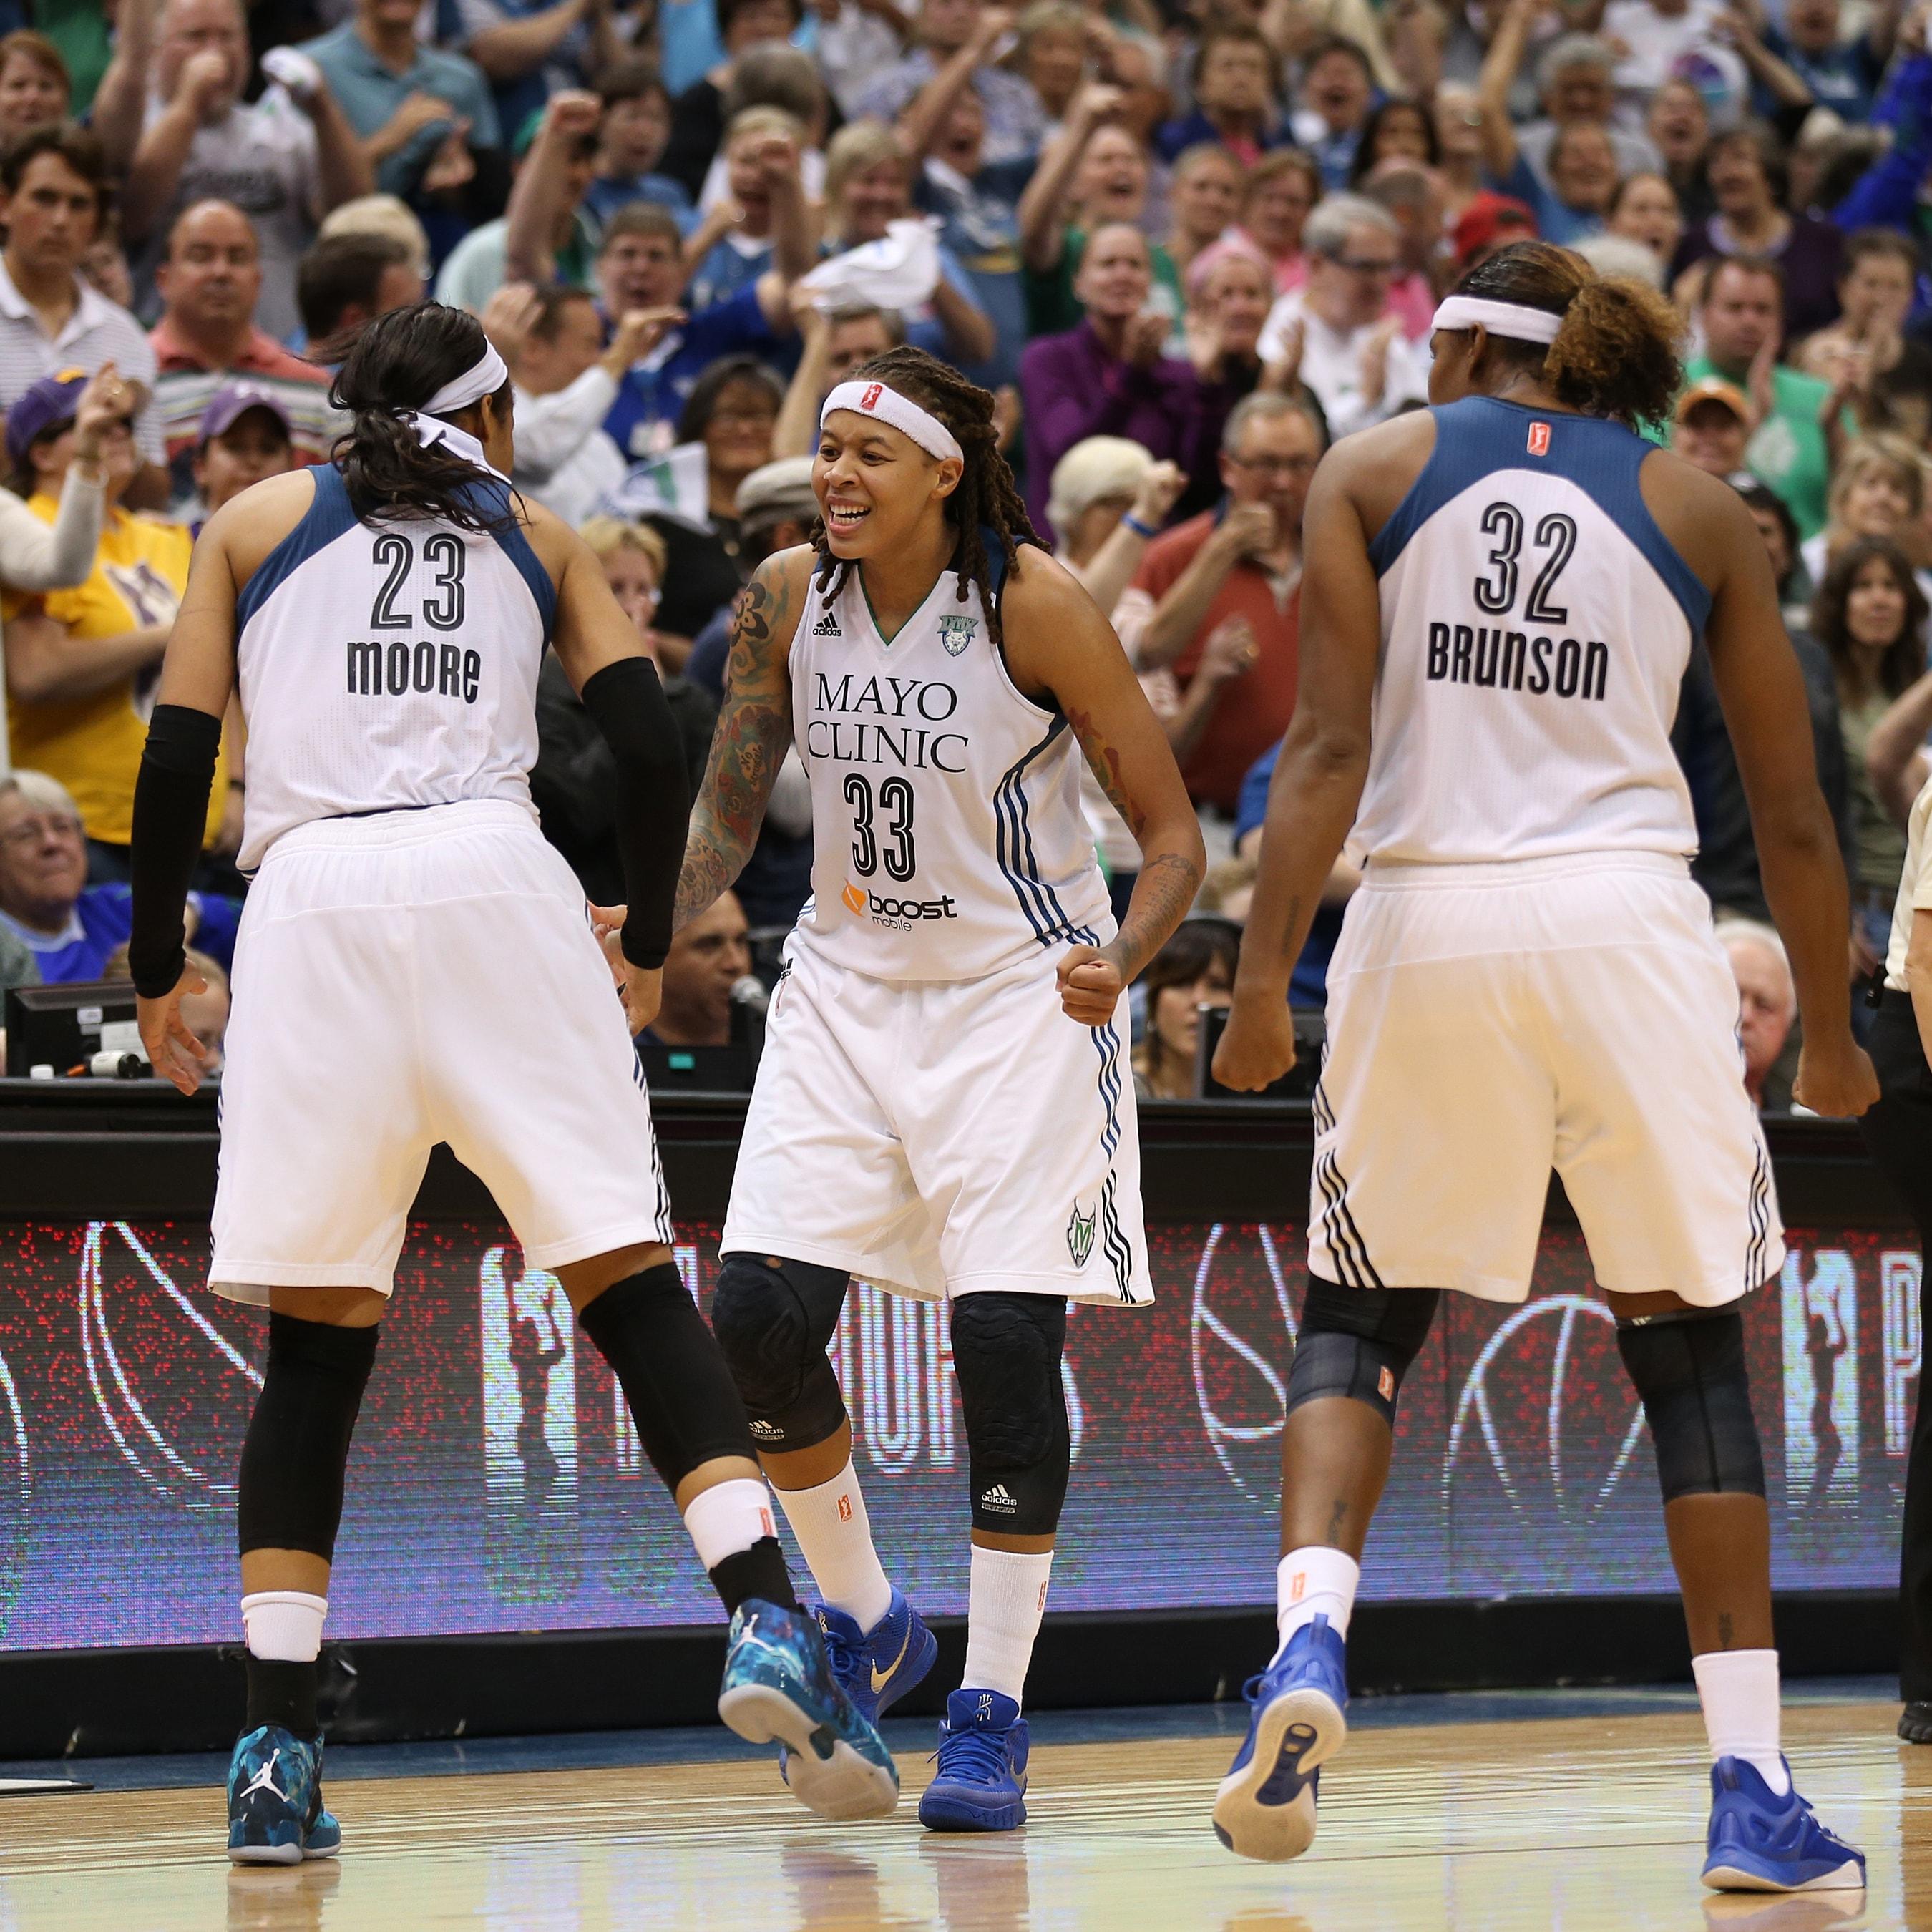 Los Angeles Sparks v Minnesota Lynx 2015 WNBA Western Conference Semifinal Game 3